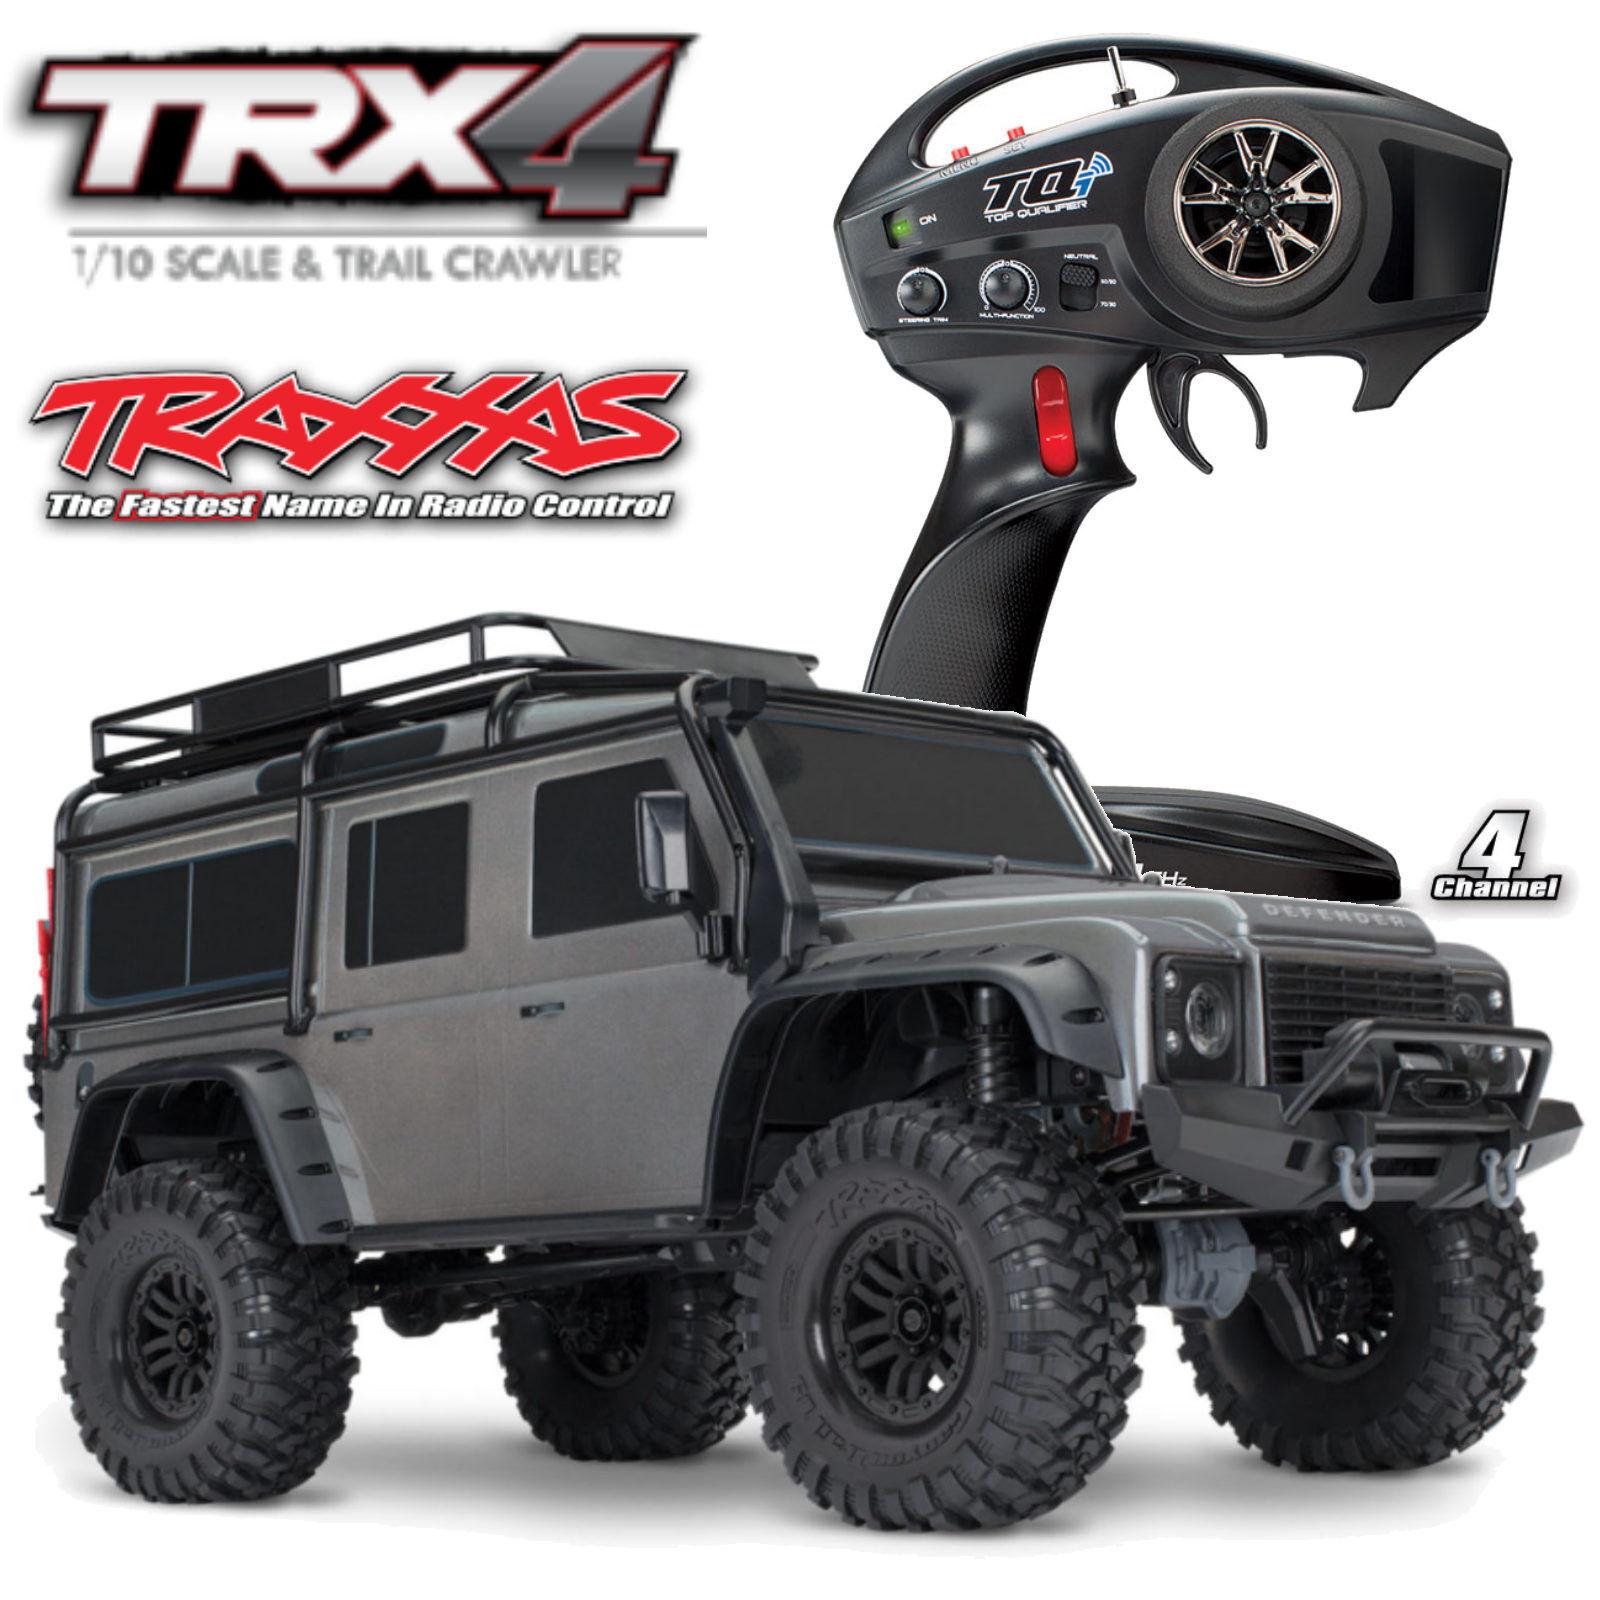 Traxxas trx82056-4 plata trx-4 Land Rover Crawler rojo 1-10 Crawler 2,4 GHz